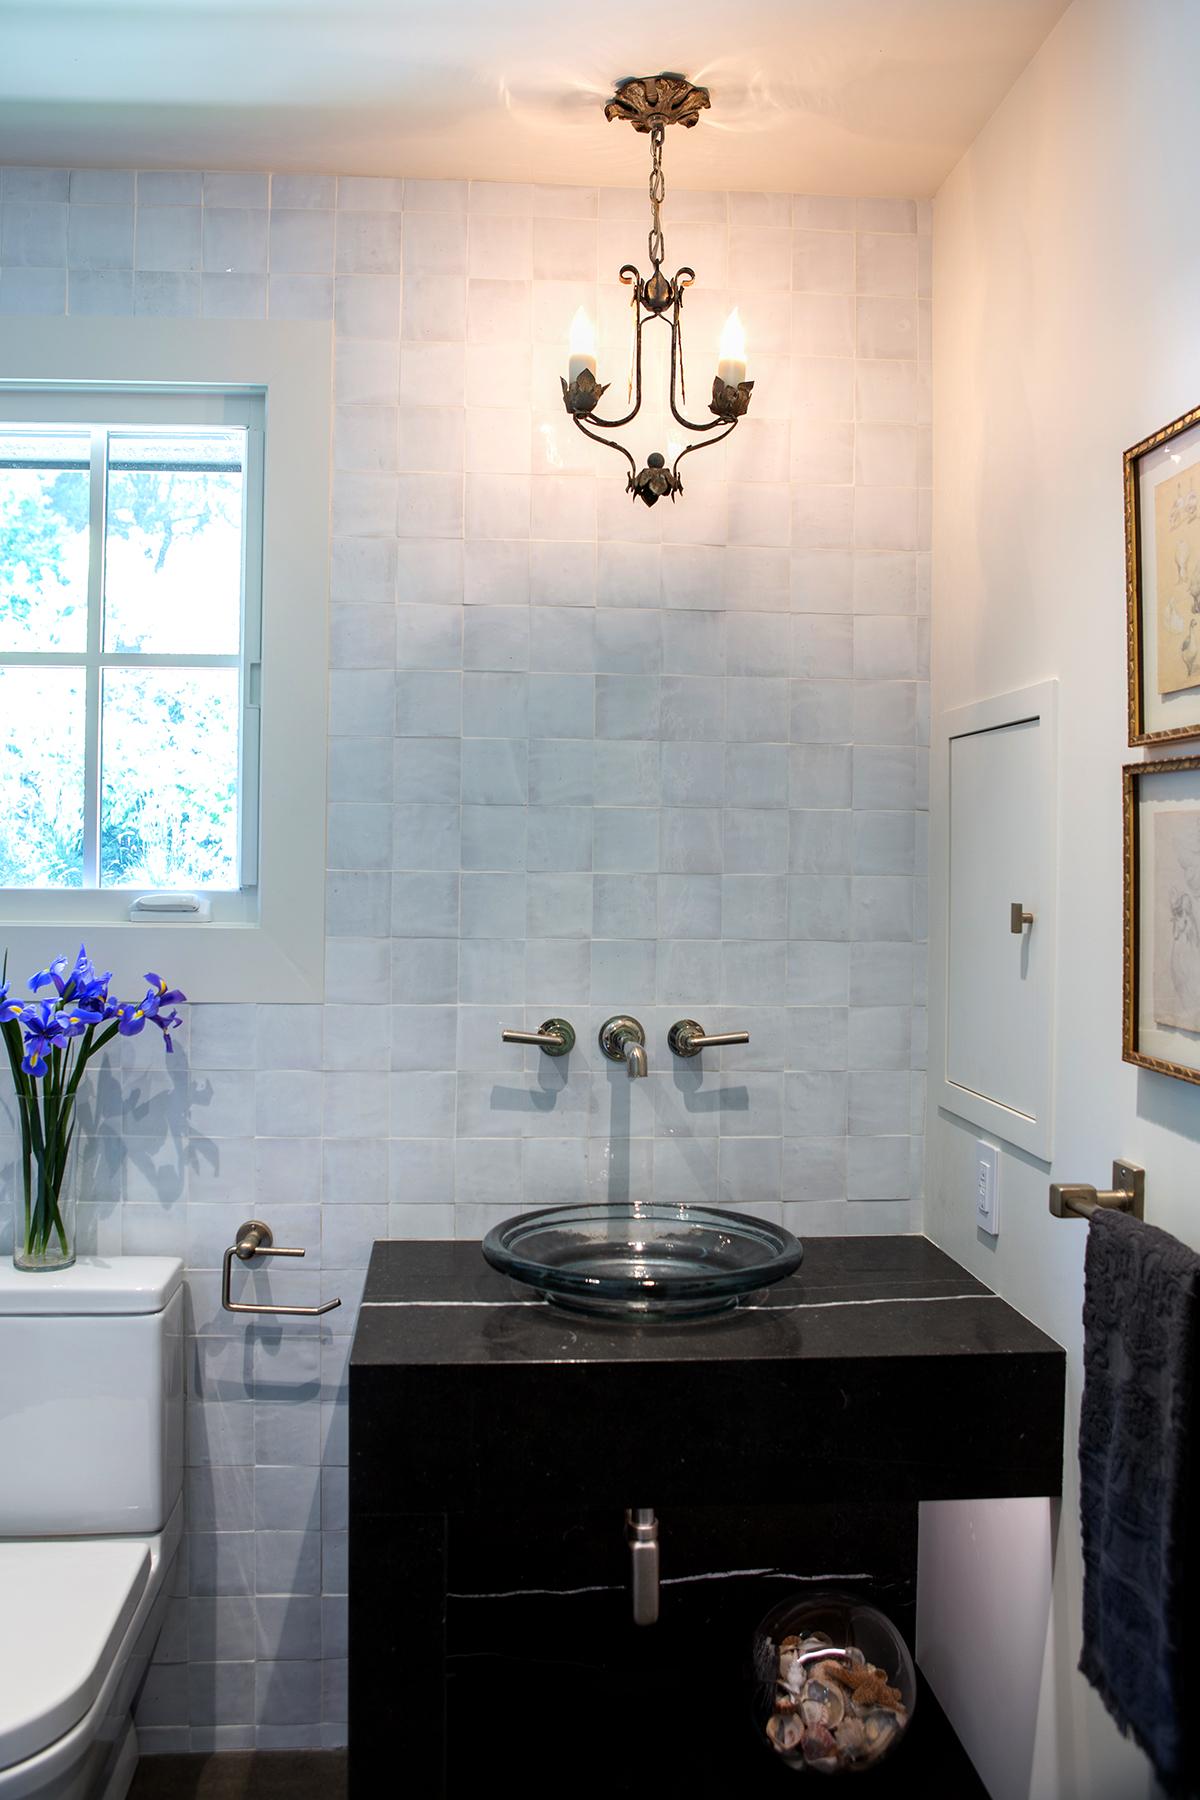 small bathroom with glass sink.jpg